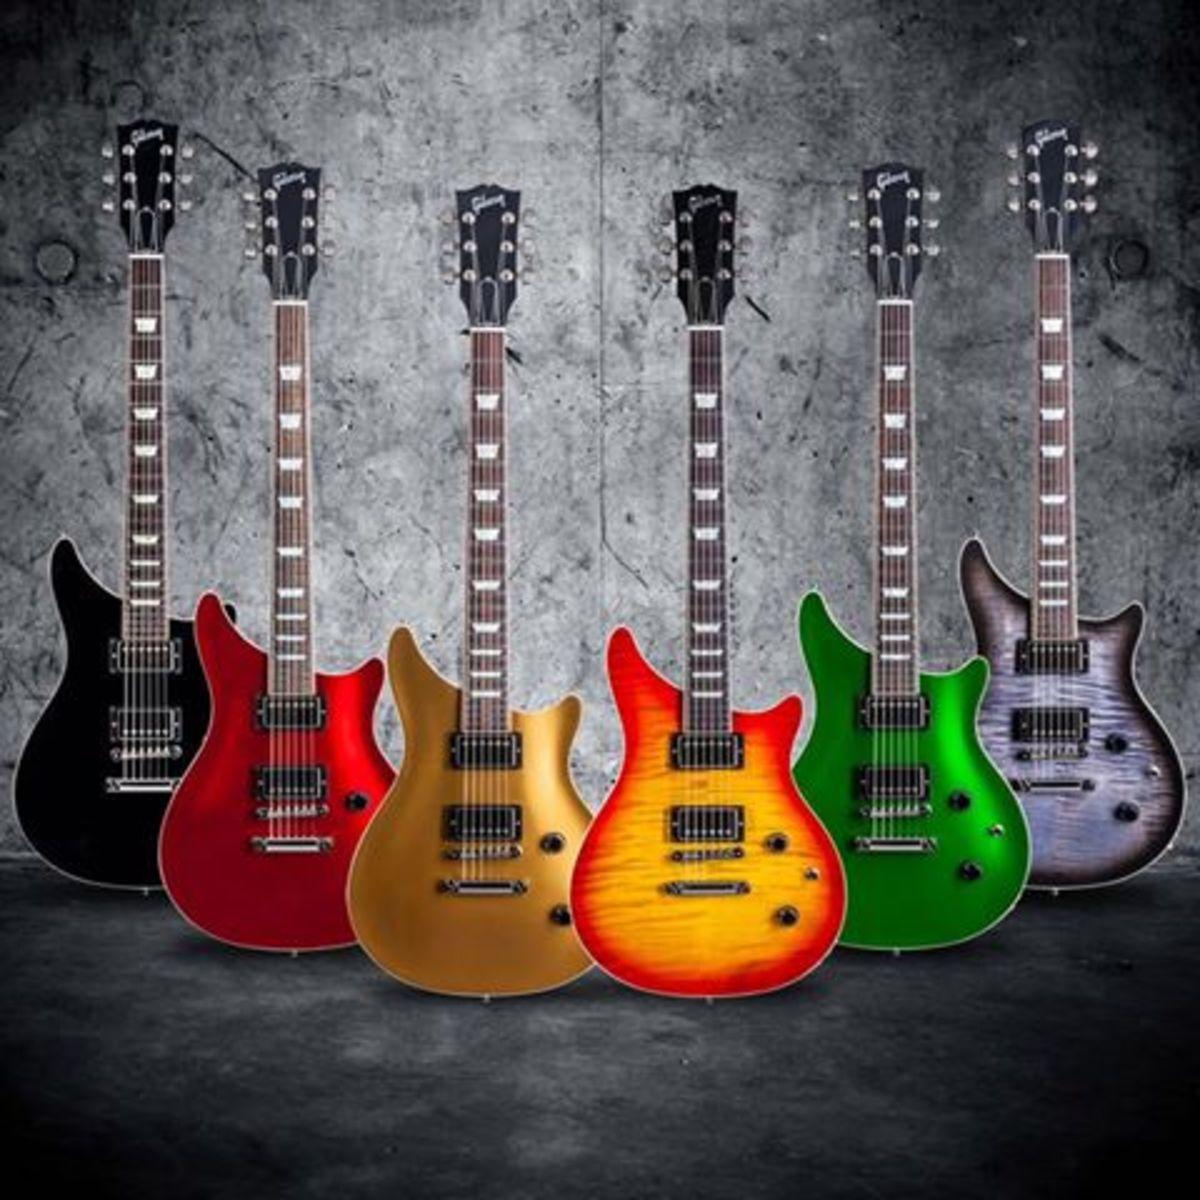 Gibson Custom Modern Doublecut Guitar Vs The Tak Matsumoto Doublecut